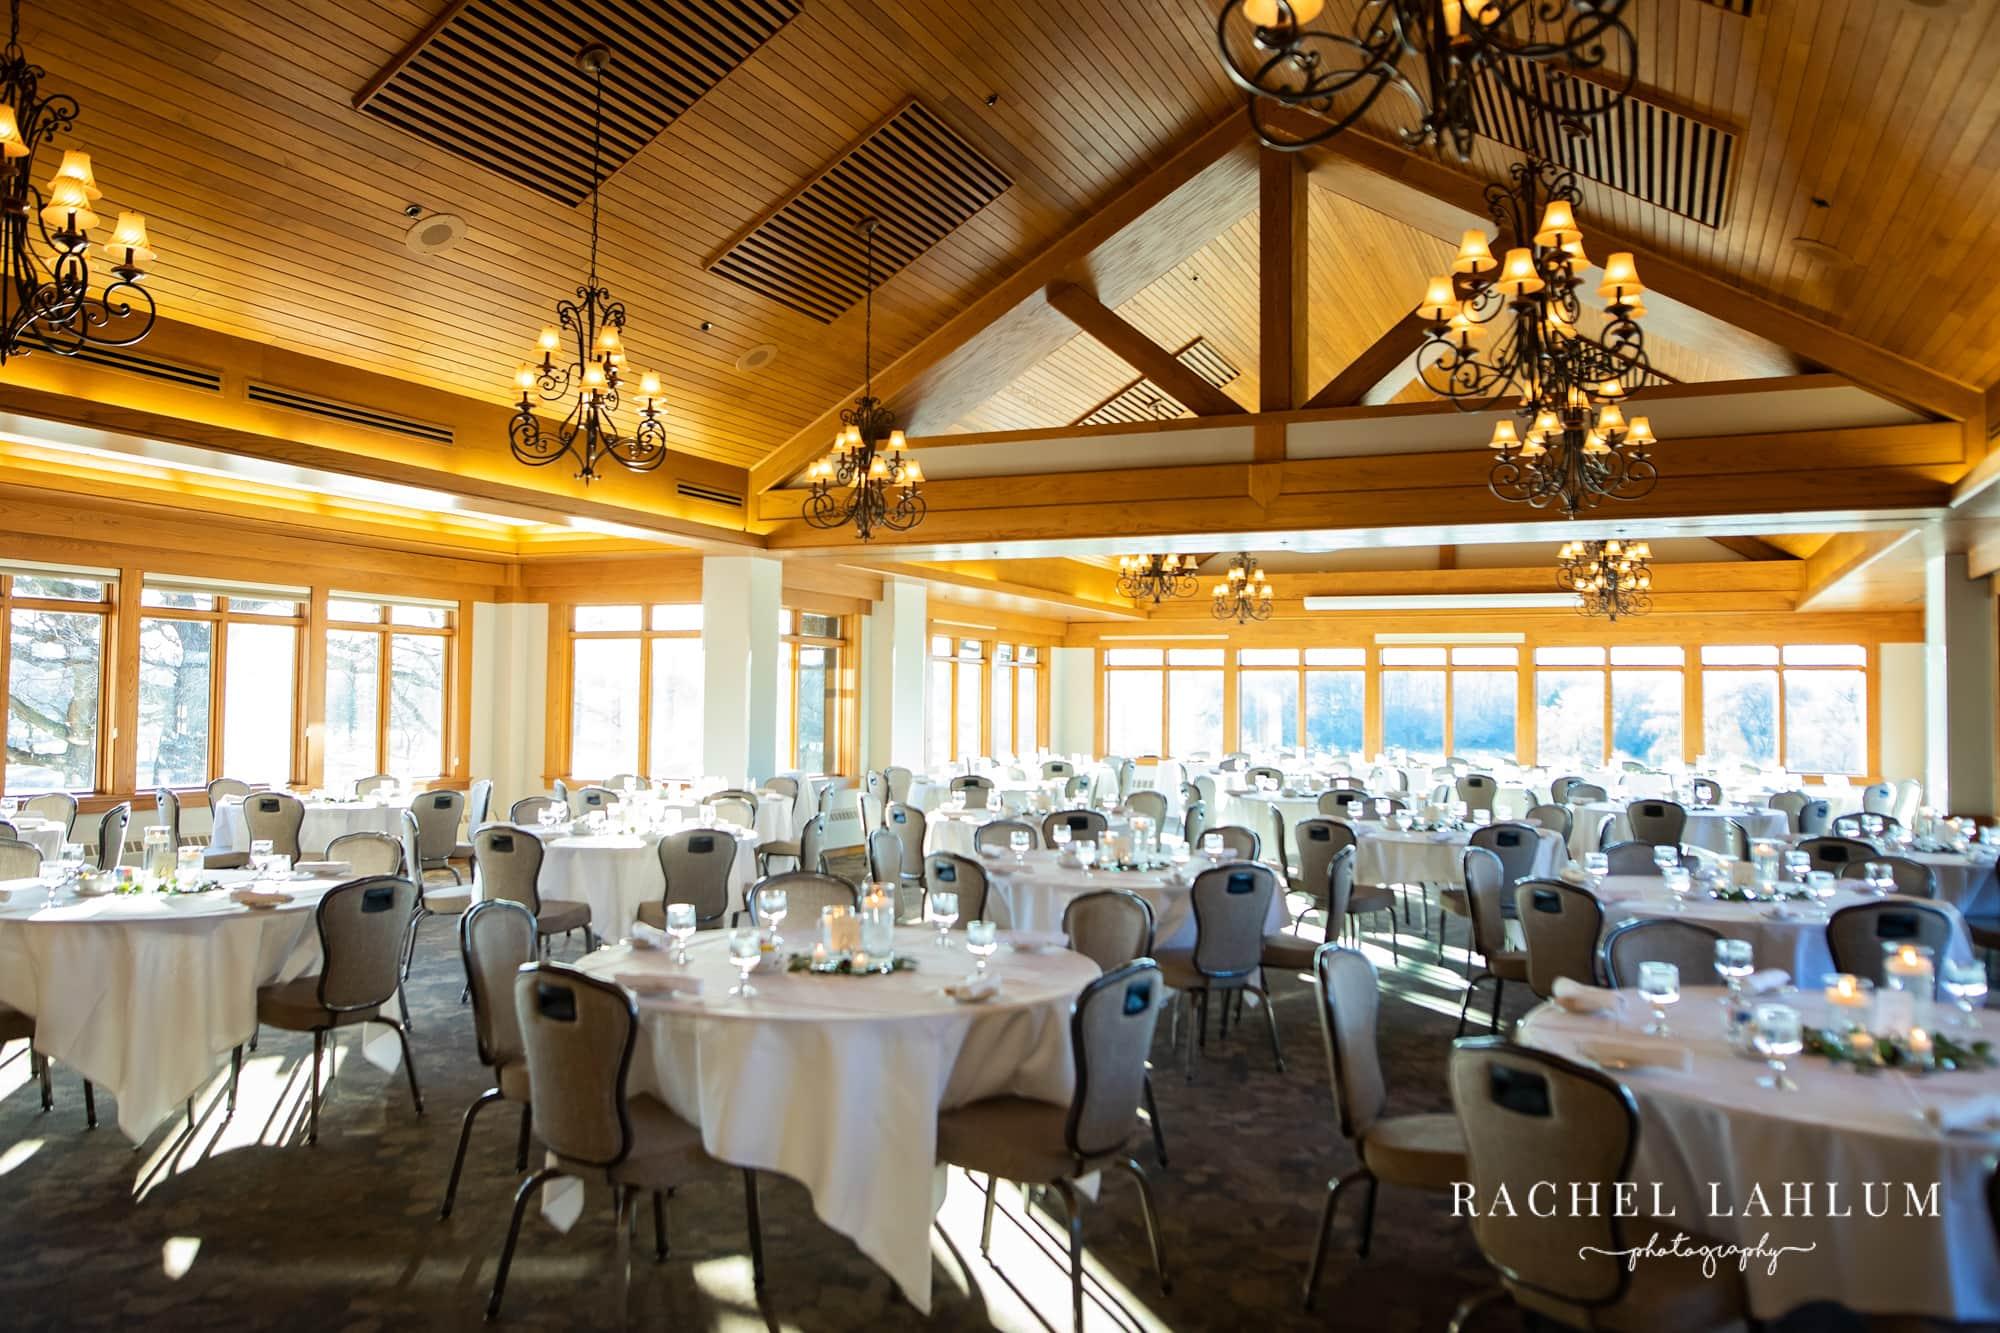 Medakota Country Club reception room in St. Paul, Minnesota.